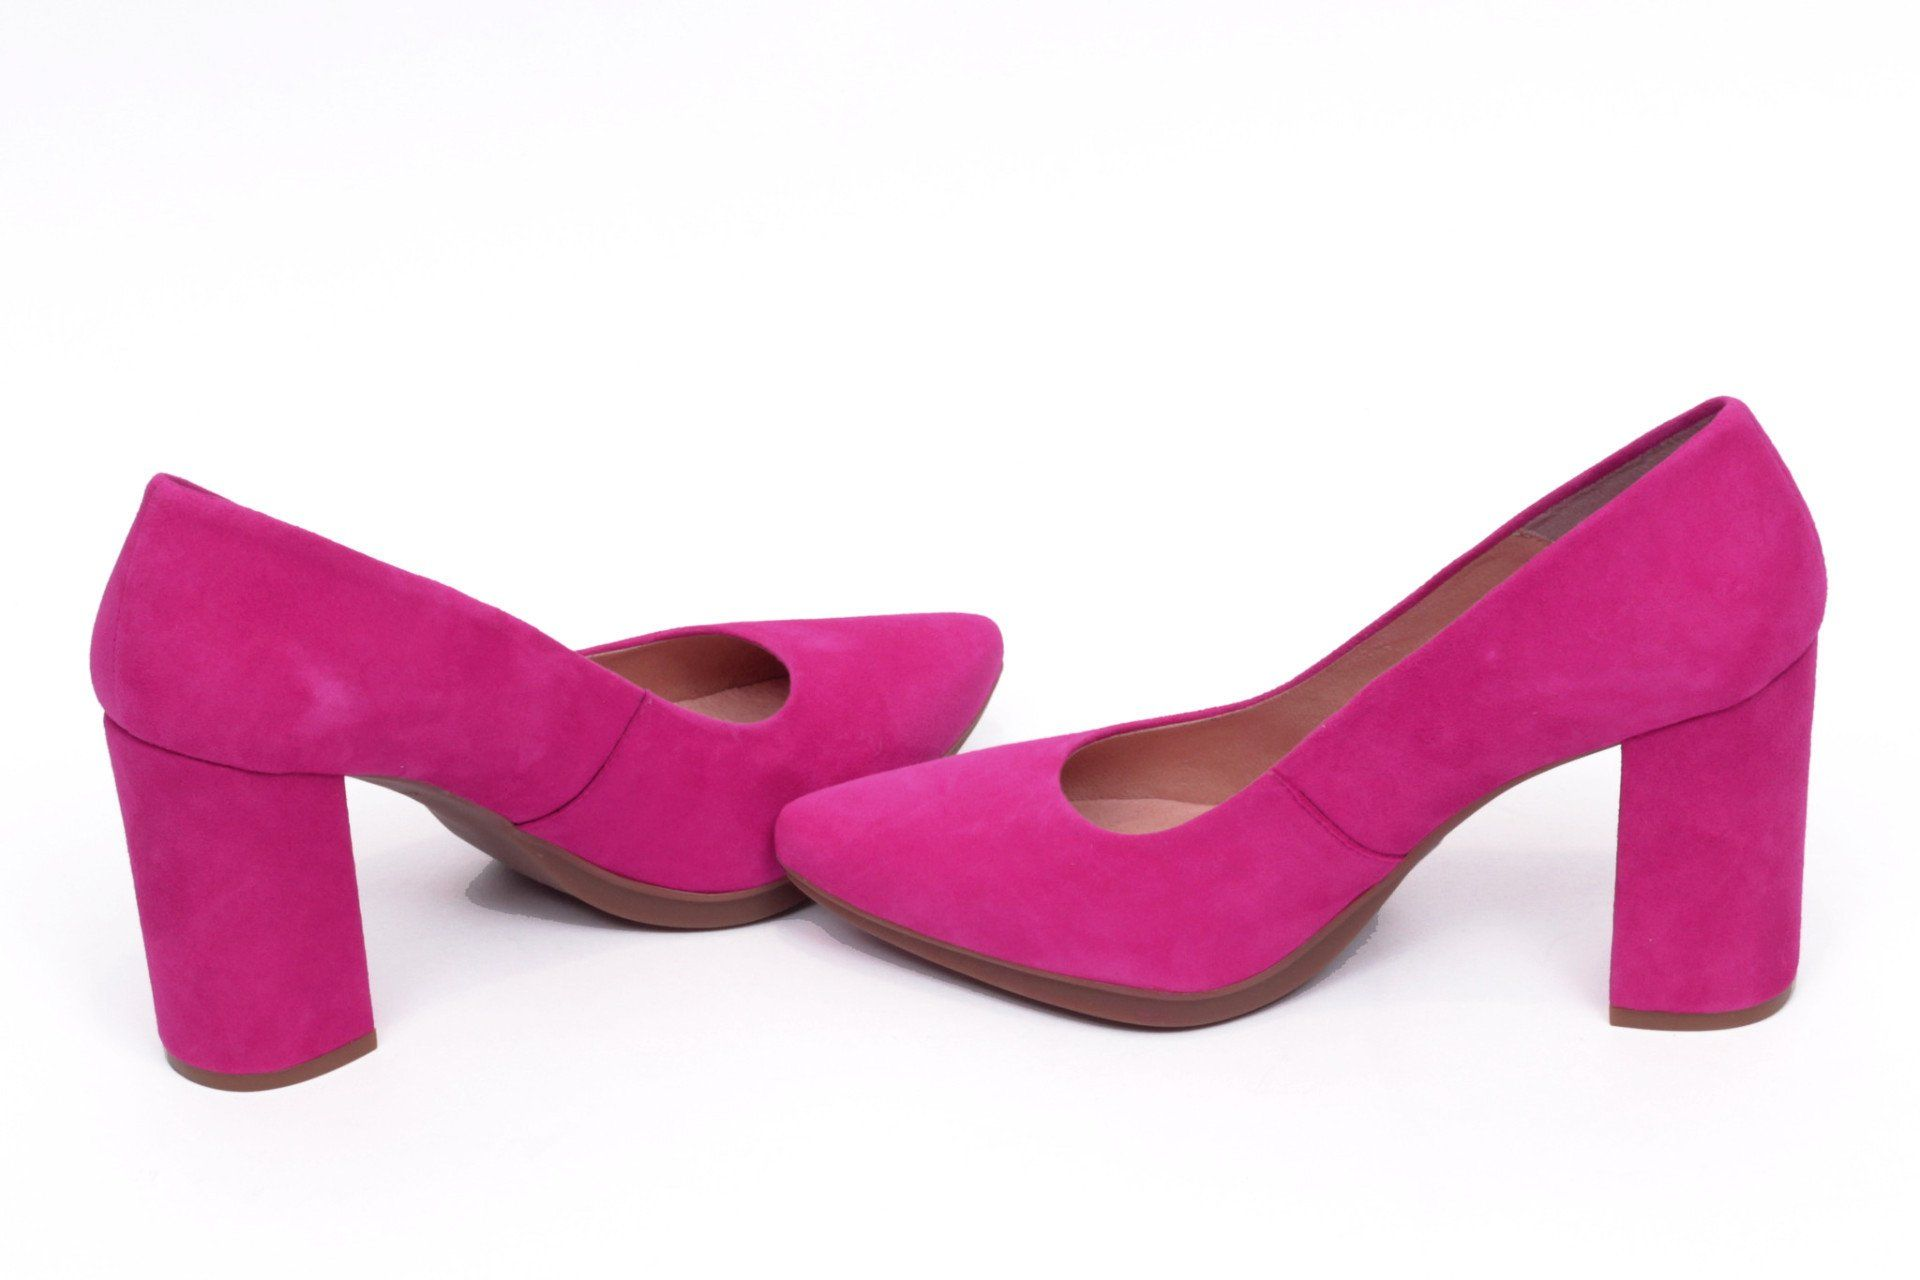 a09874d82 miMaO Urban S Rosa –Zapato mujer de tacon salones vestir cómodo maquillaje  - women high heels shoes comfort pumps fuchsia pink